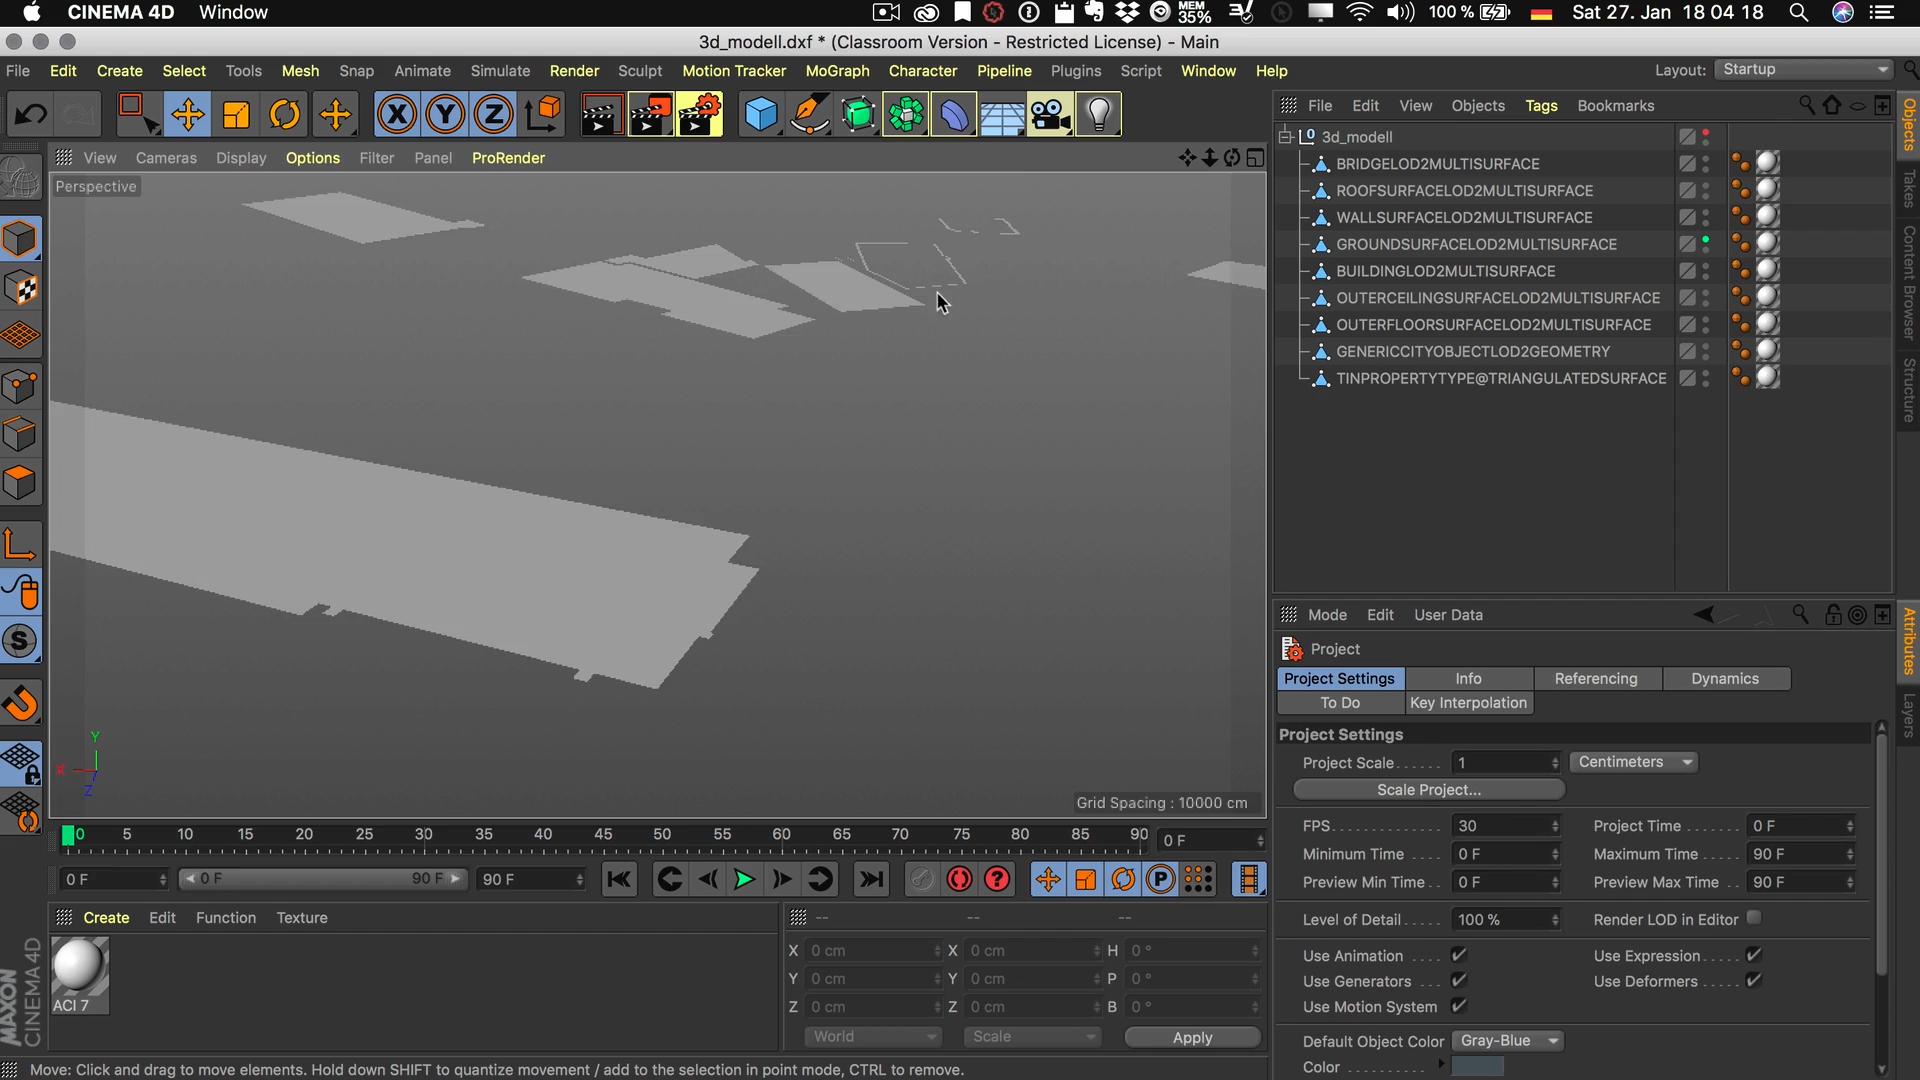 Cinema4D 3D-Stadtmodell Unterobjekt Ebene DXF sinnlos Inhalt